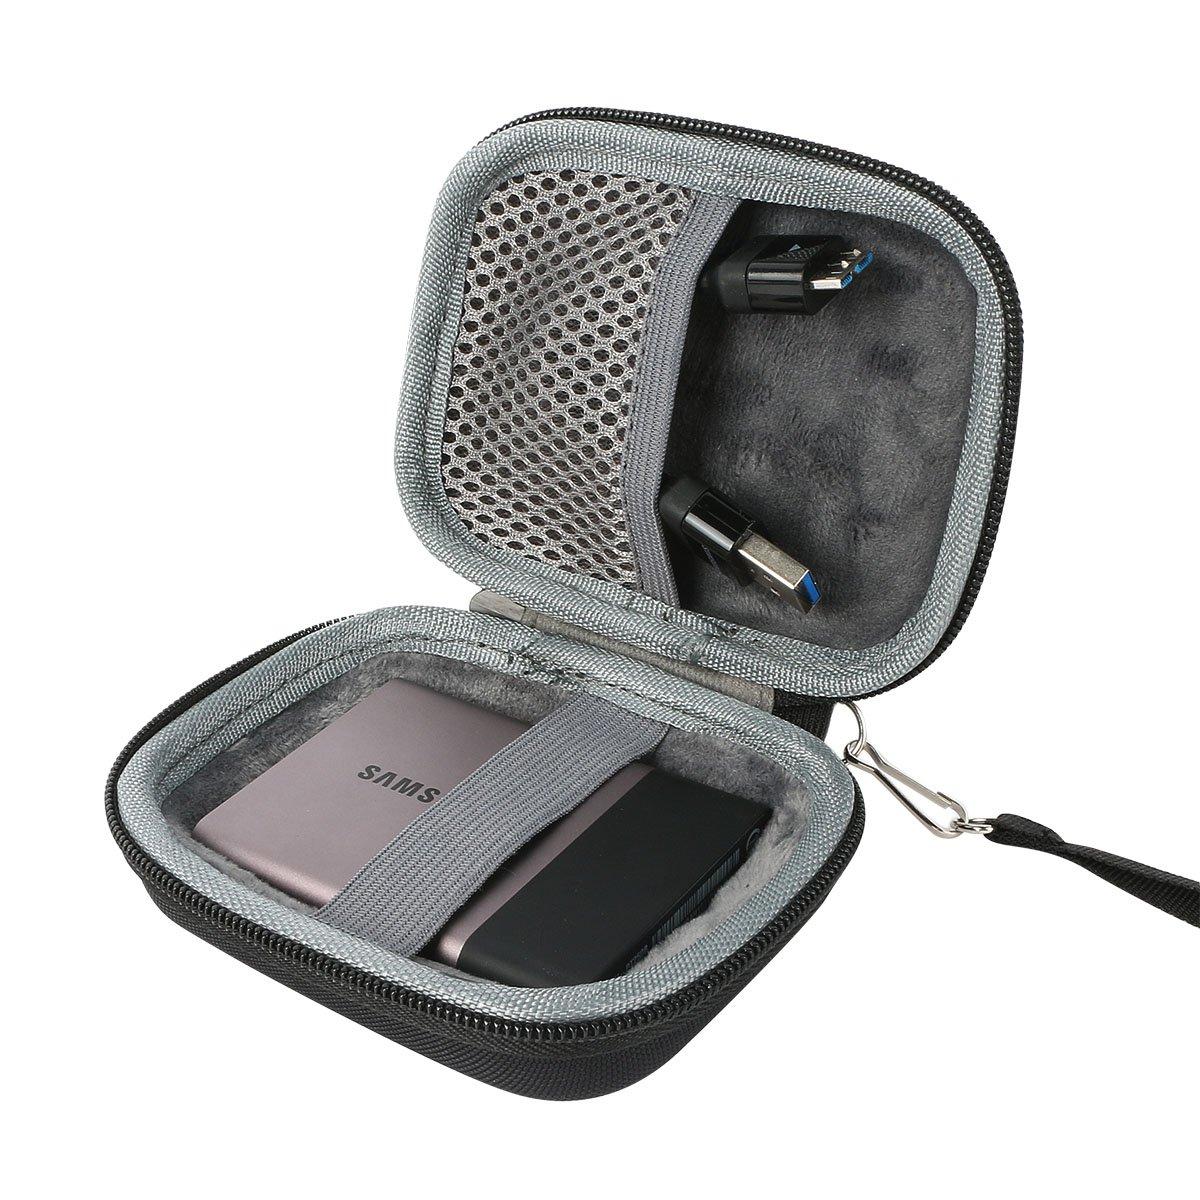 co2CREA Hart Reise Schutz H/ülle Etui Tasche f/ür Samsung Portable SSD T3 T5 250GB //500GB //1TB //2TB External Solid State Drive Rot//F/ür 2 SSD